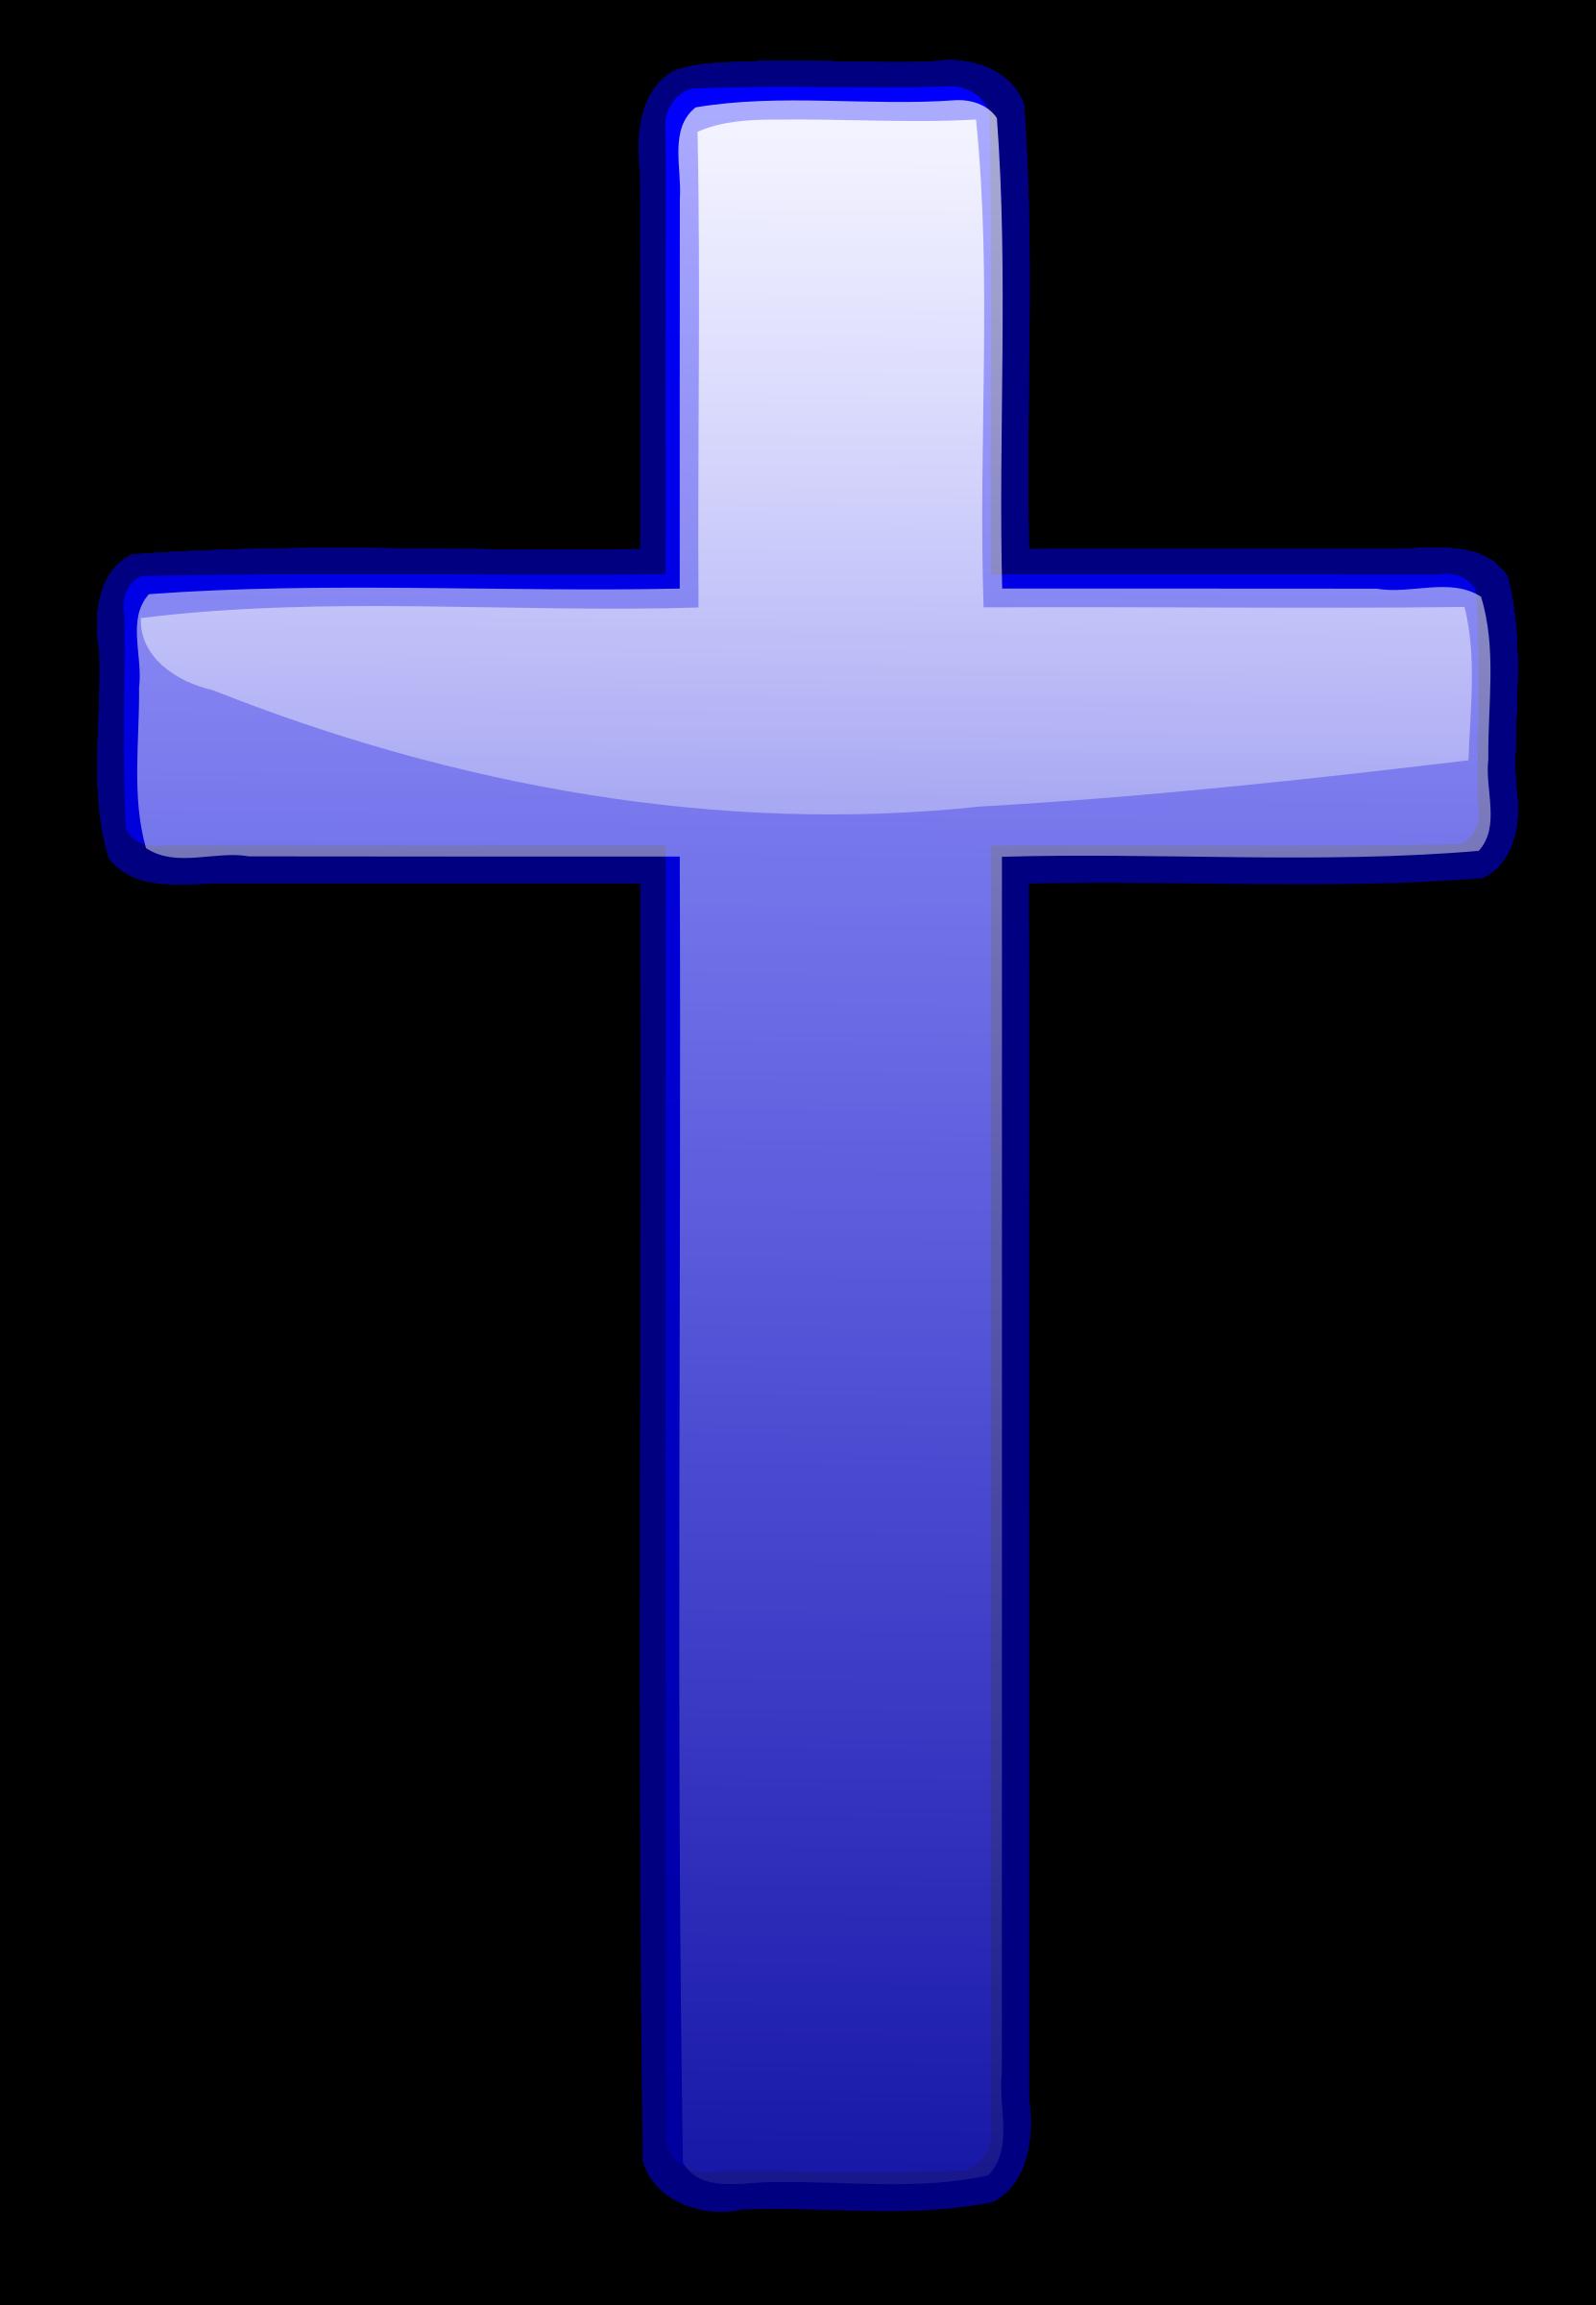 Big image png. Clipart cross blue